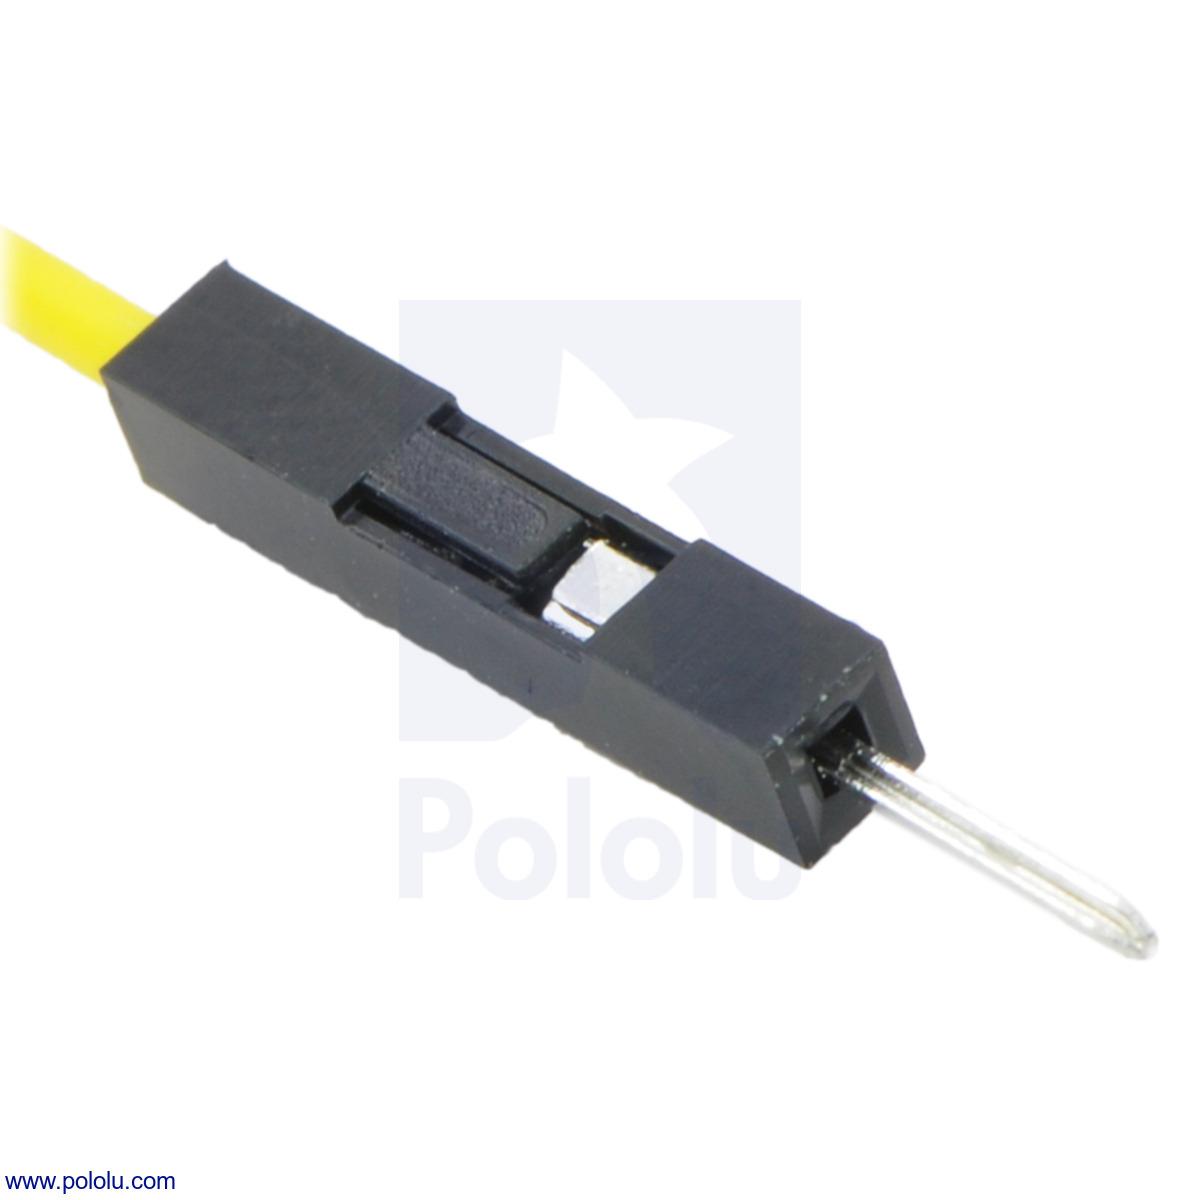 Pololu - Premium Jumper Wires